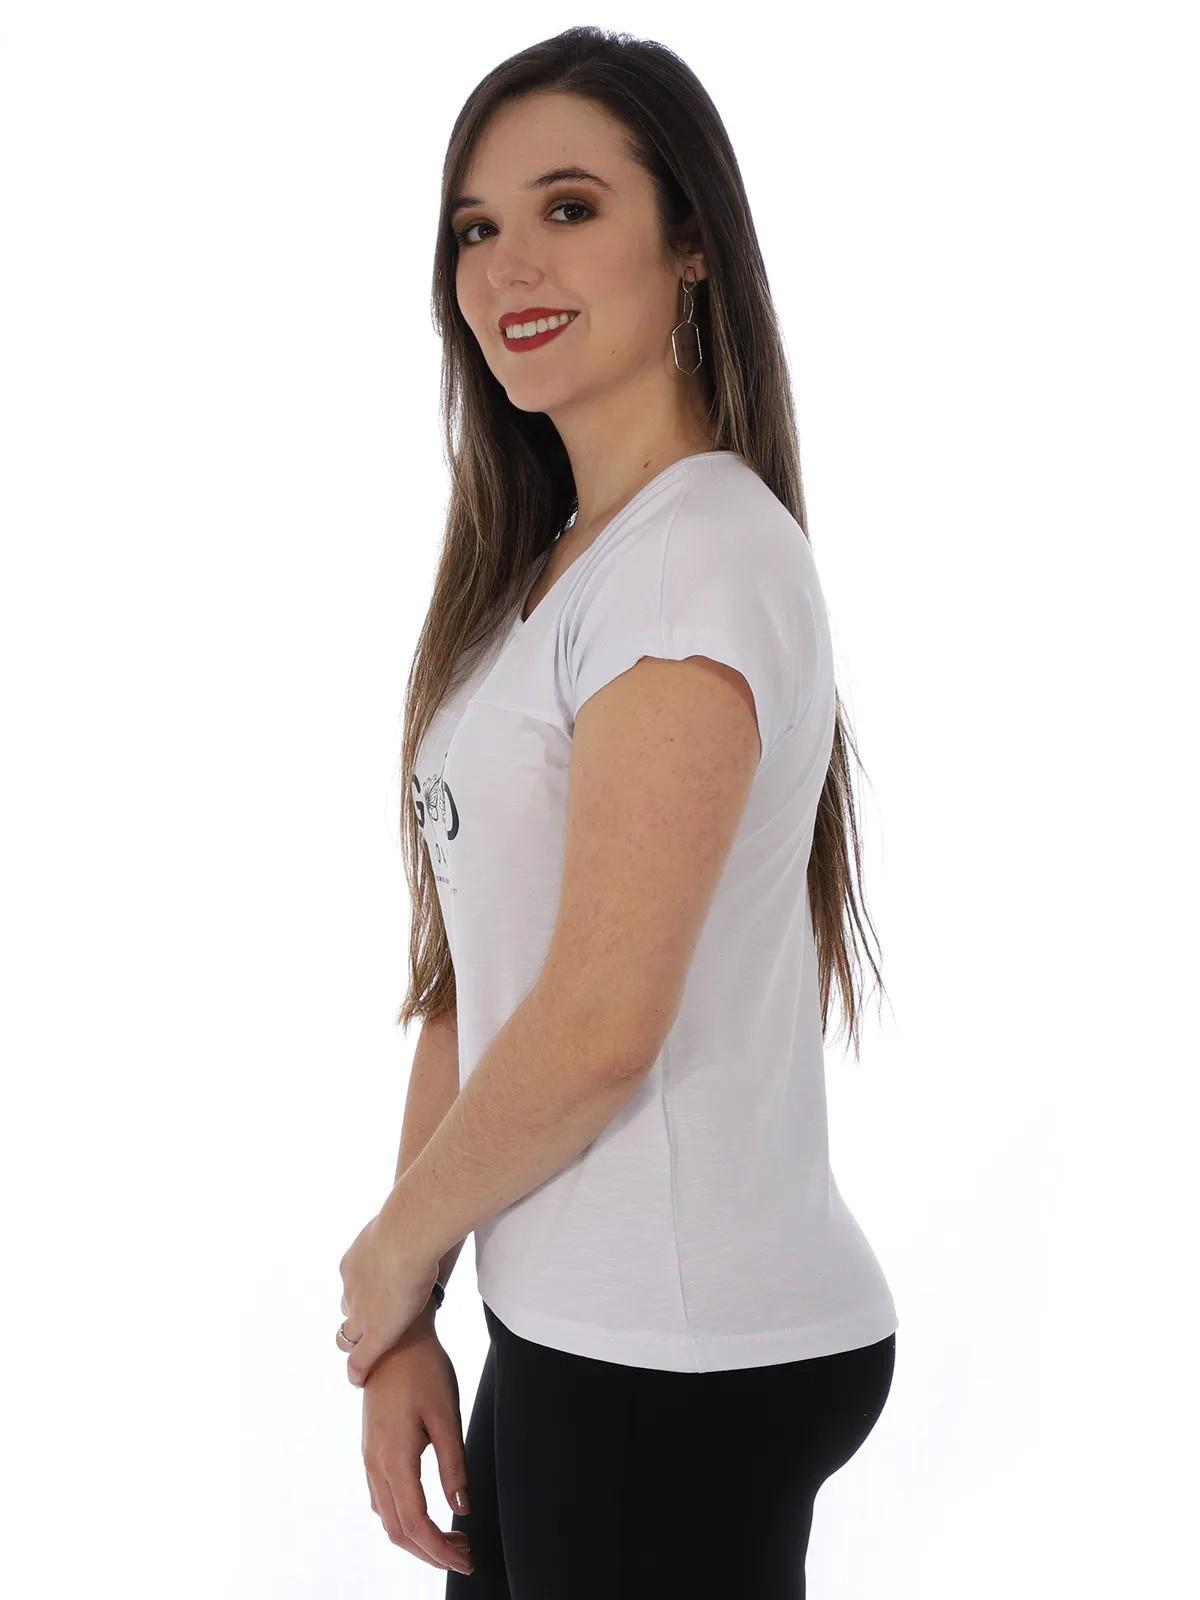 Blusa Feminina Decote Canoa Manga Curta Com Estampa Branca